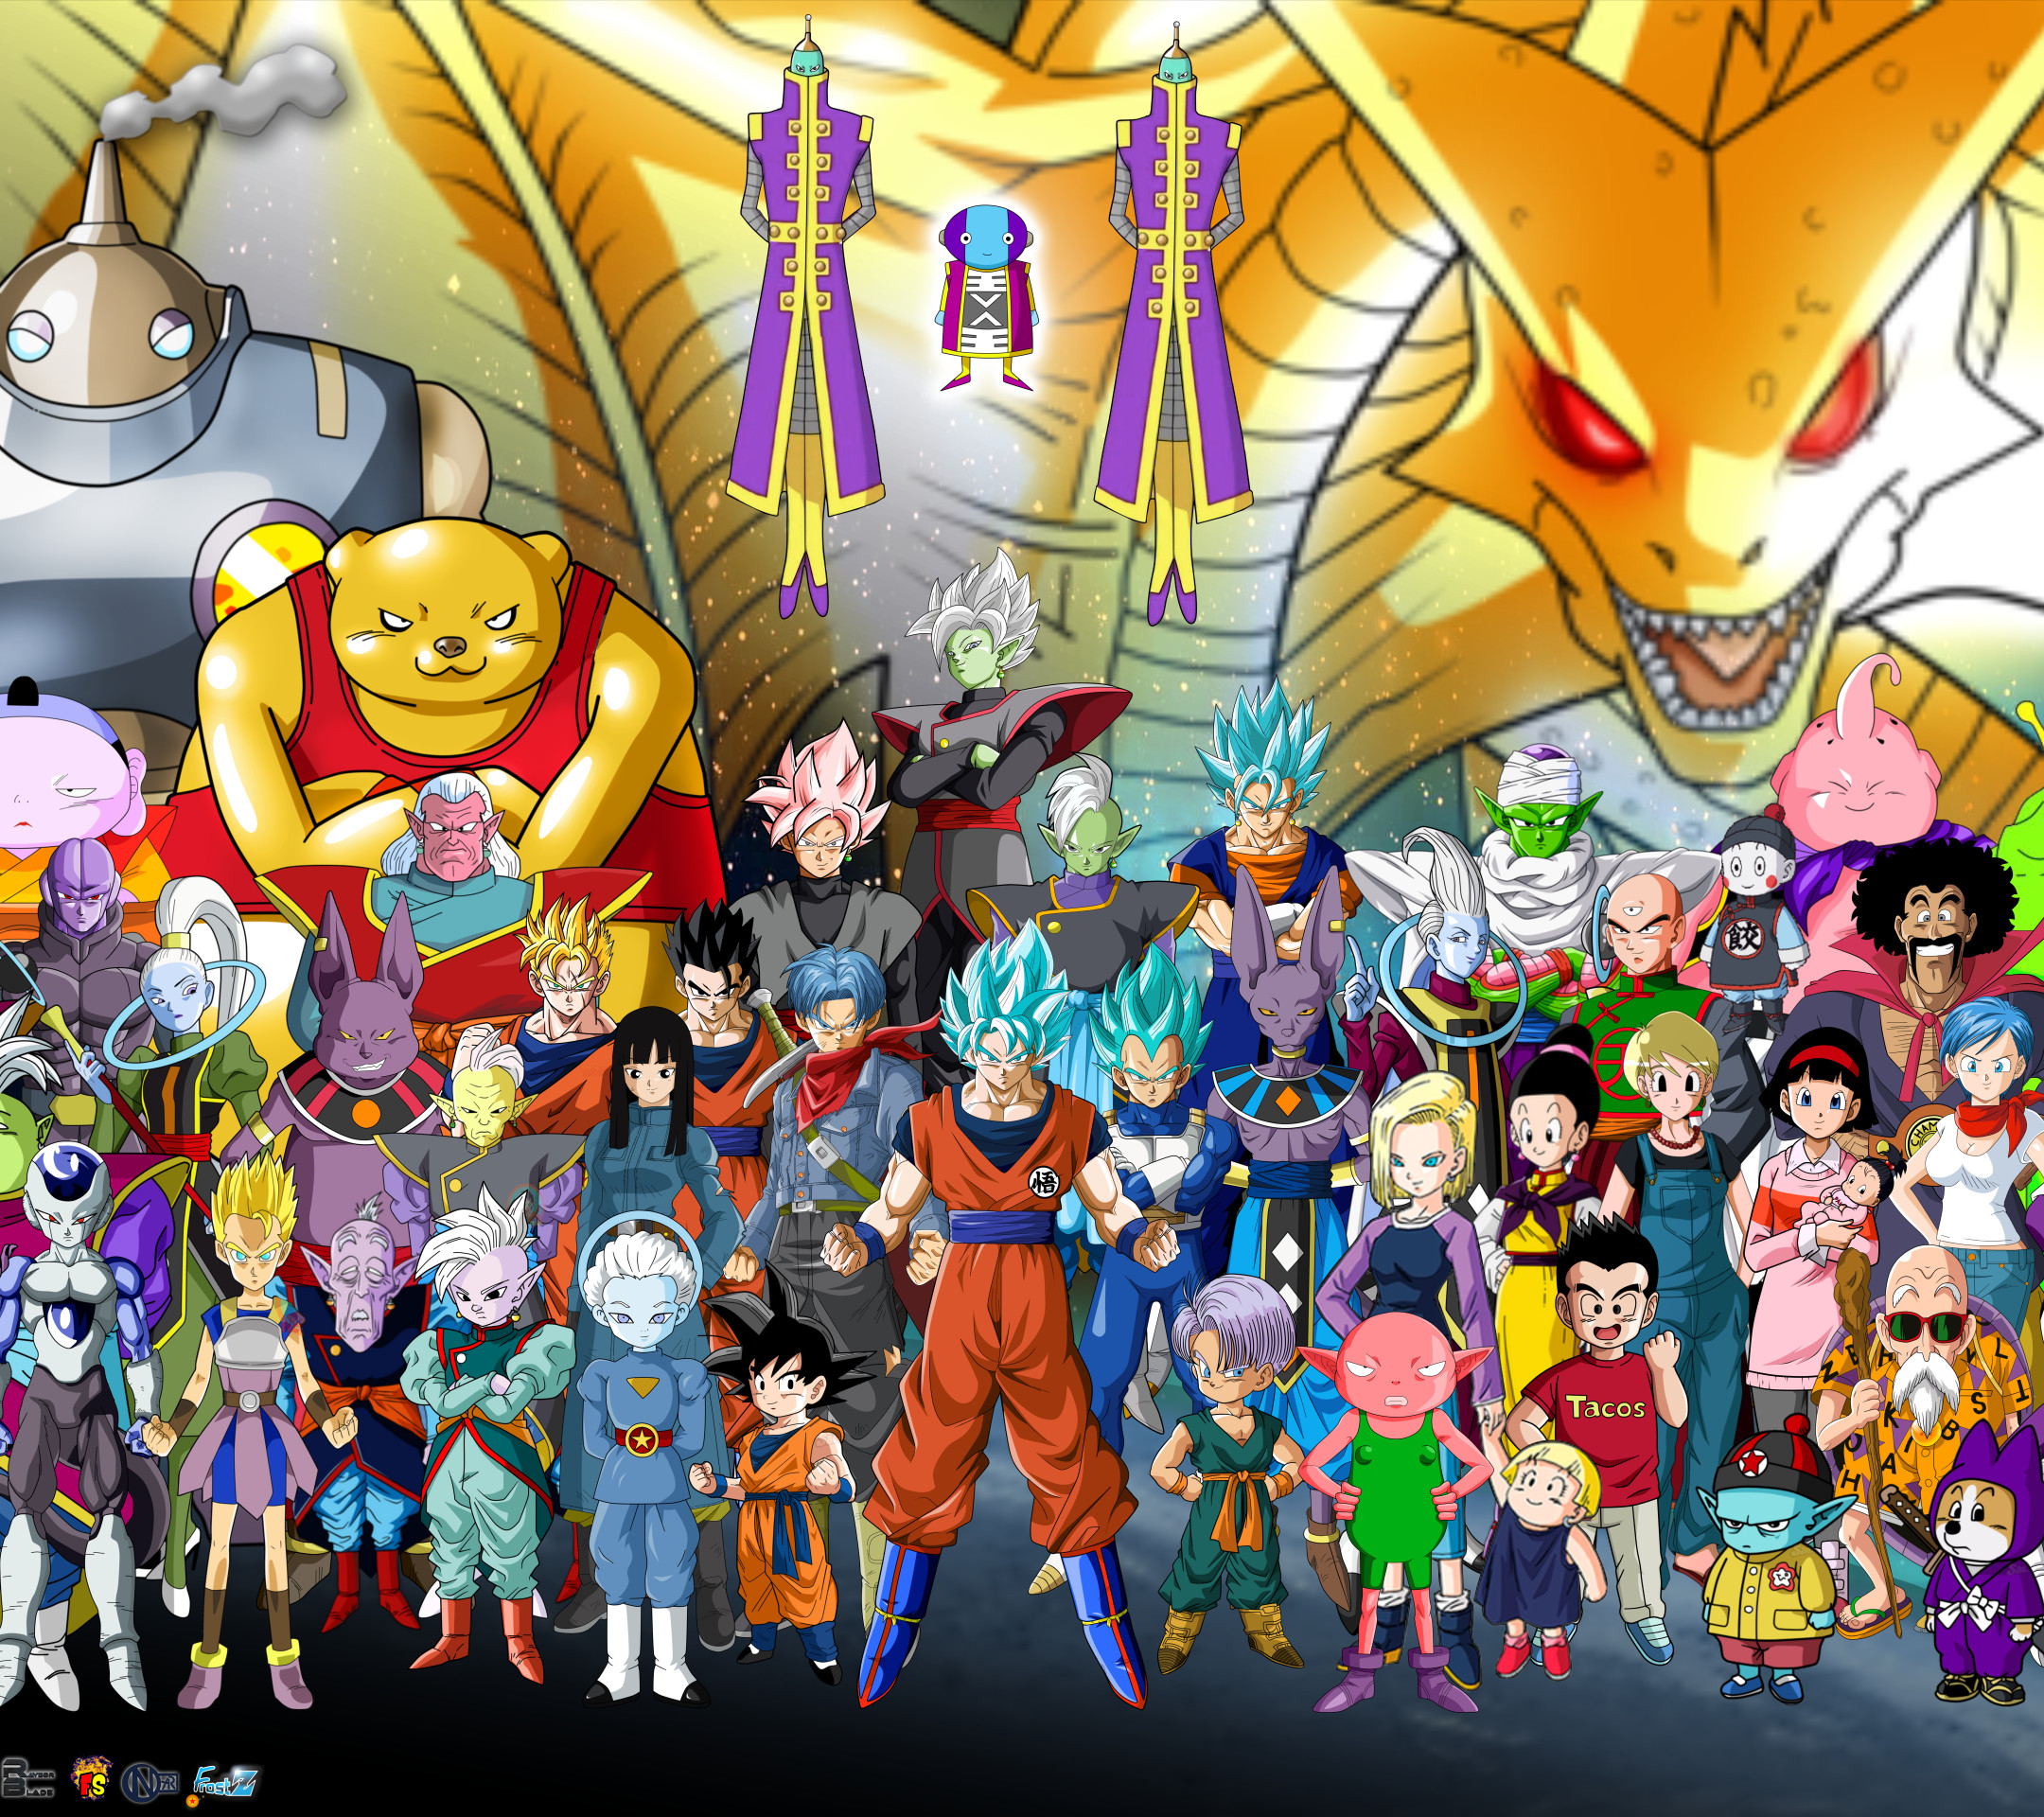 Dragon Ball Super Wallpaper Android Hd: Dragon Ball Super Wallpapers (57+ Images